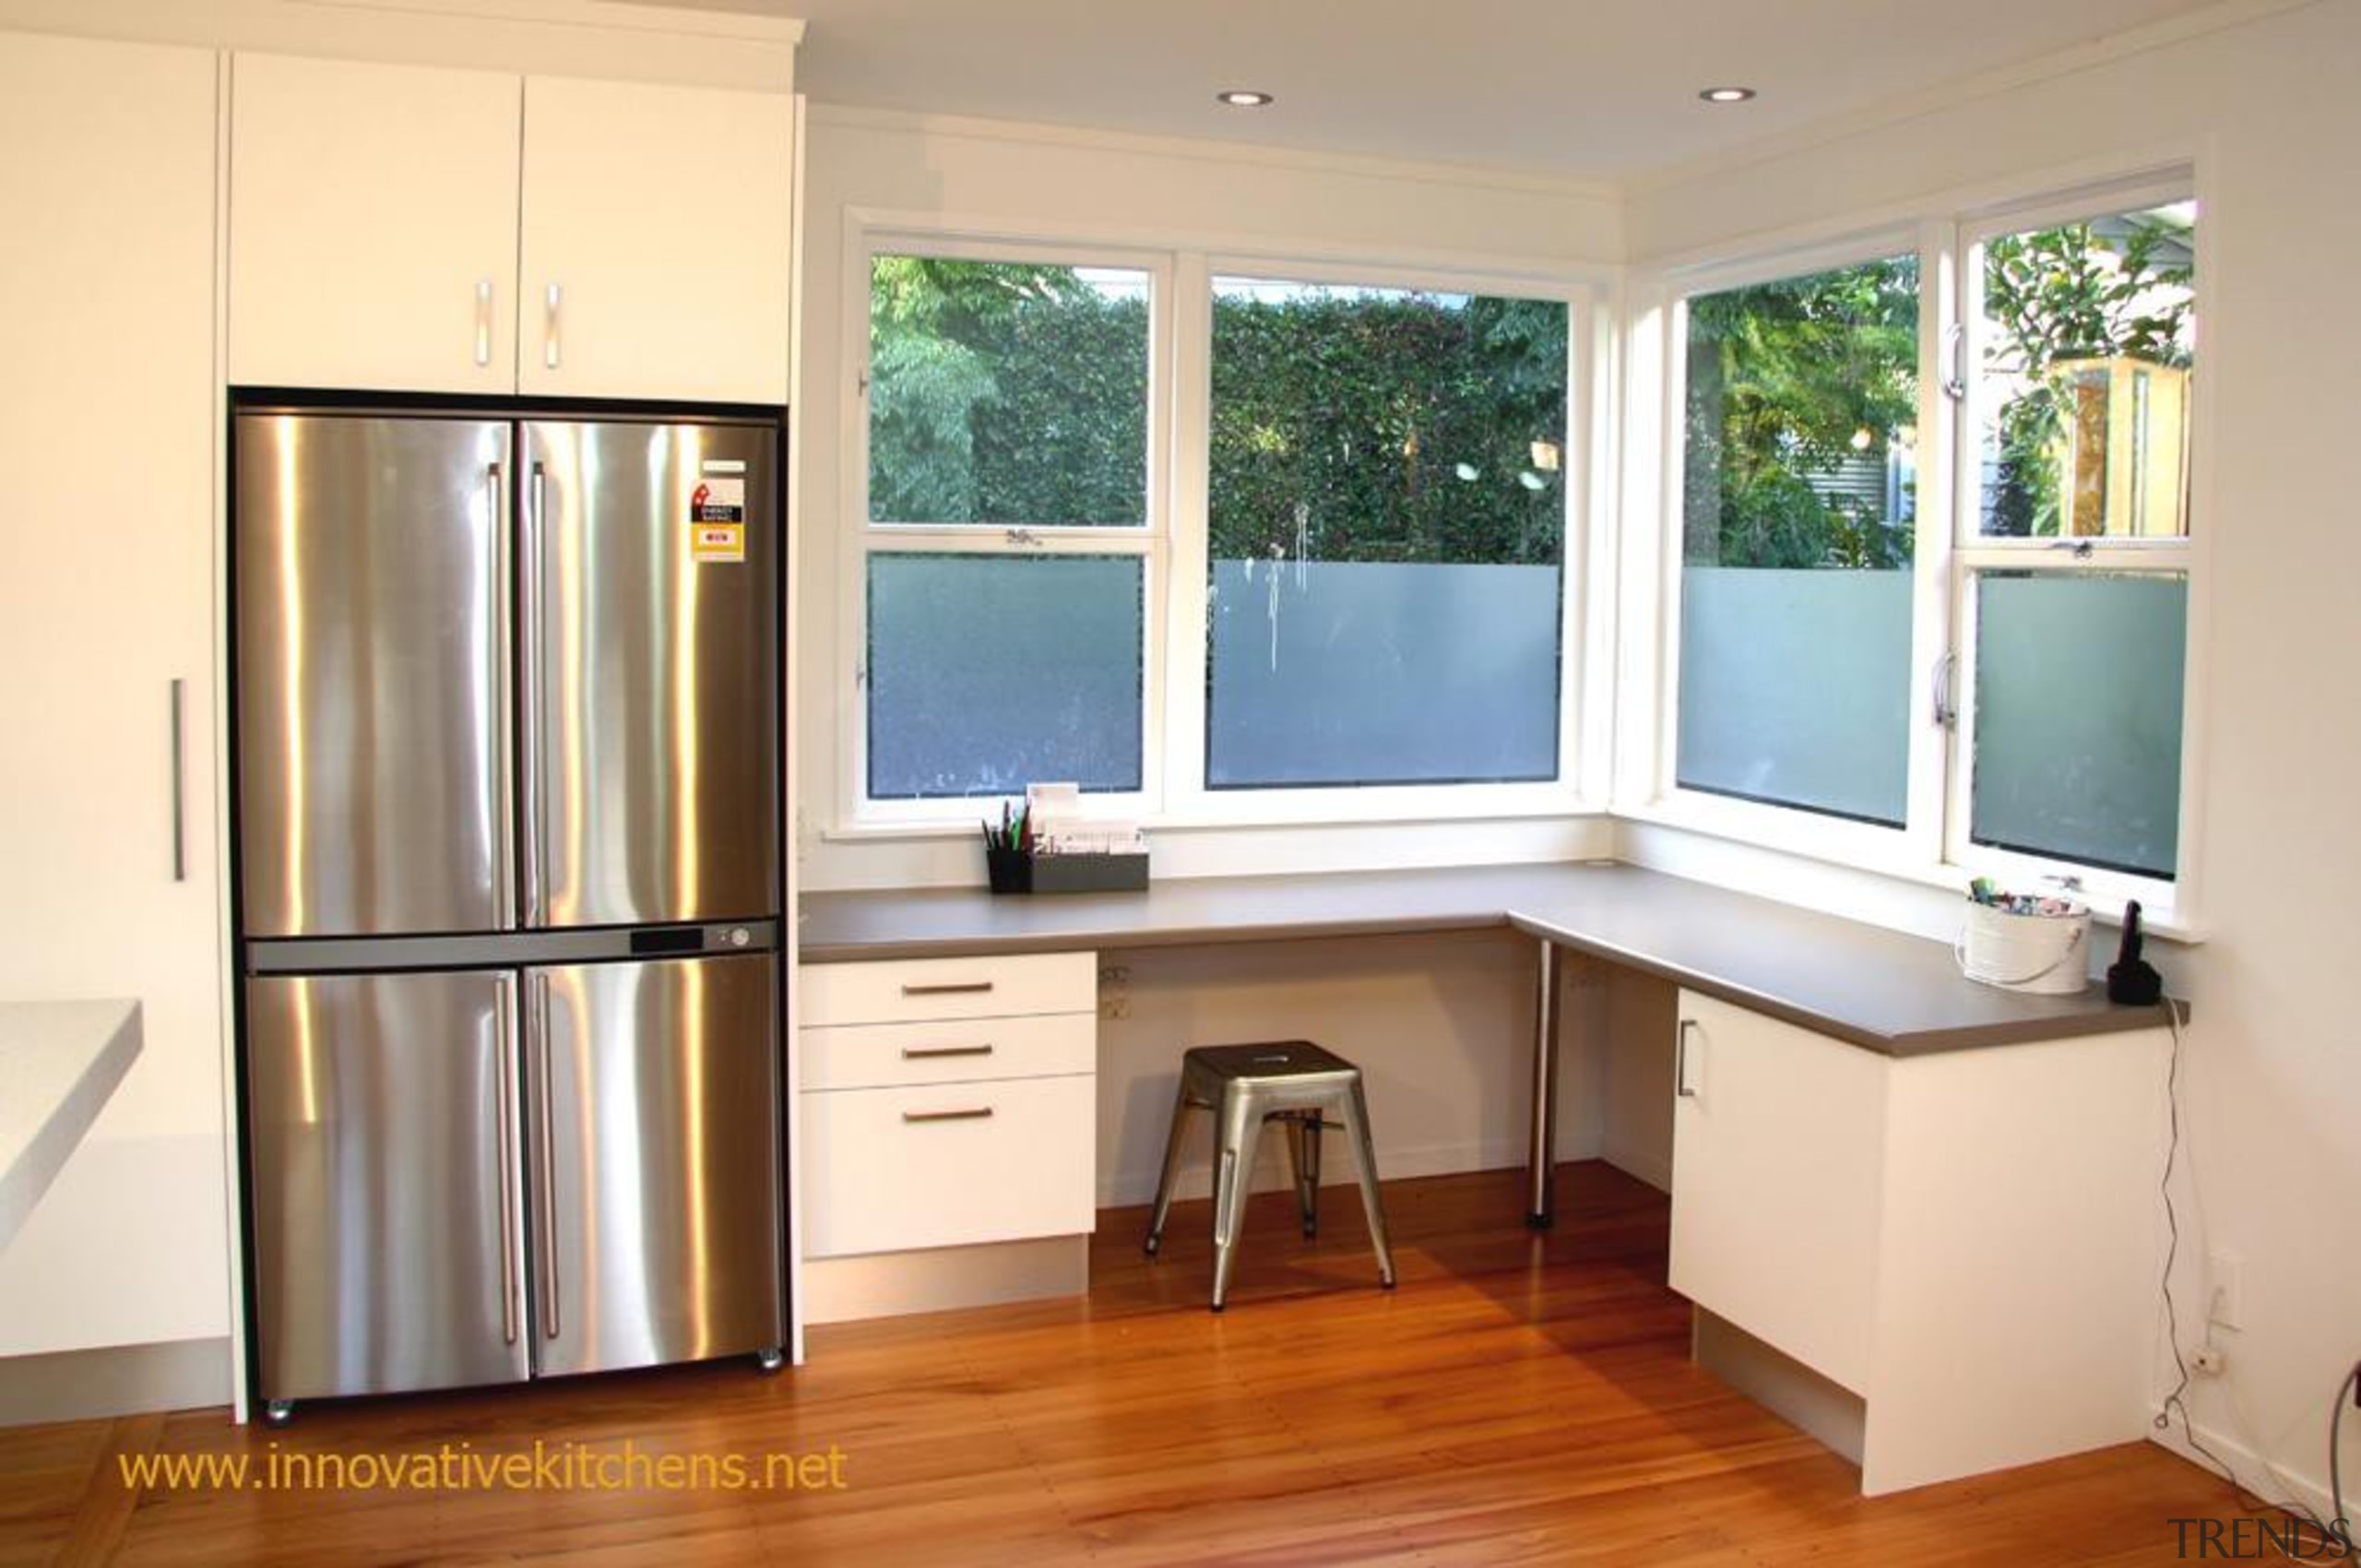 Office area, utility area, matching kitchen - modern_glendowie_2013_5.jpg cabinetry, floor, hardwood, home, interior design, kitchen, real estate, room, window, orange